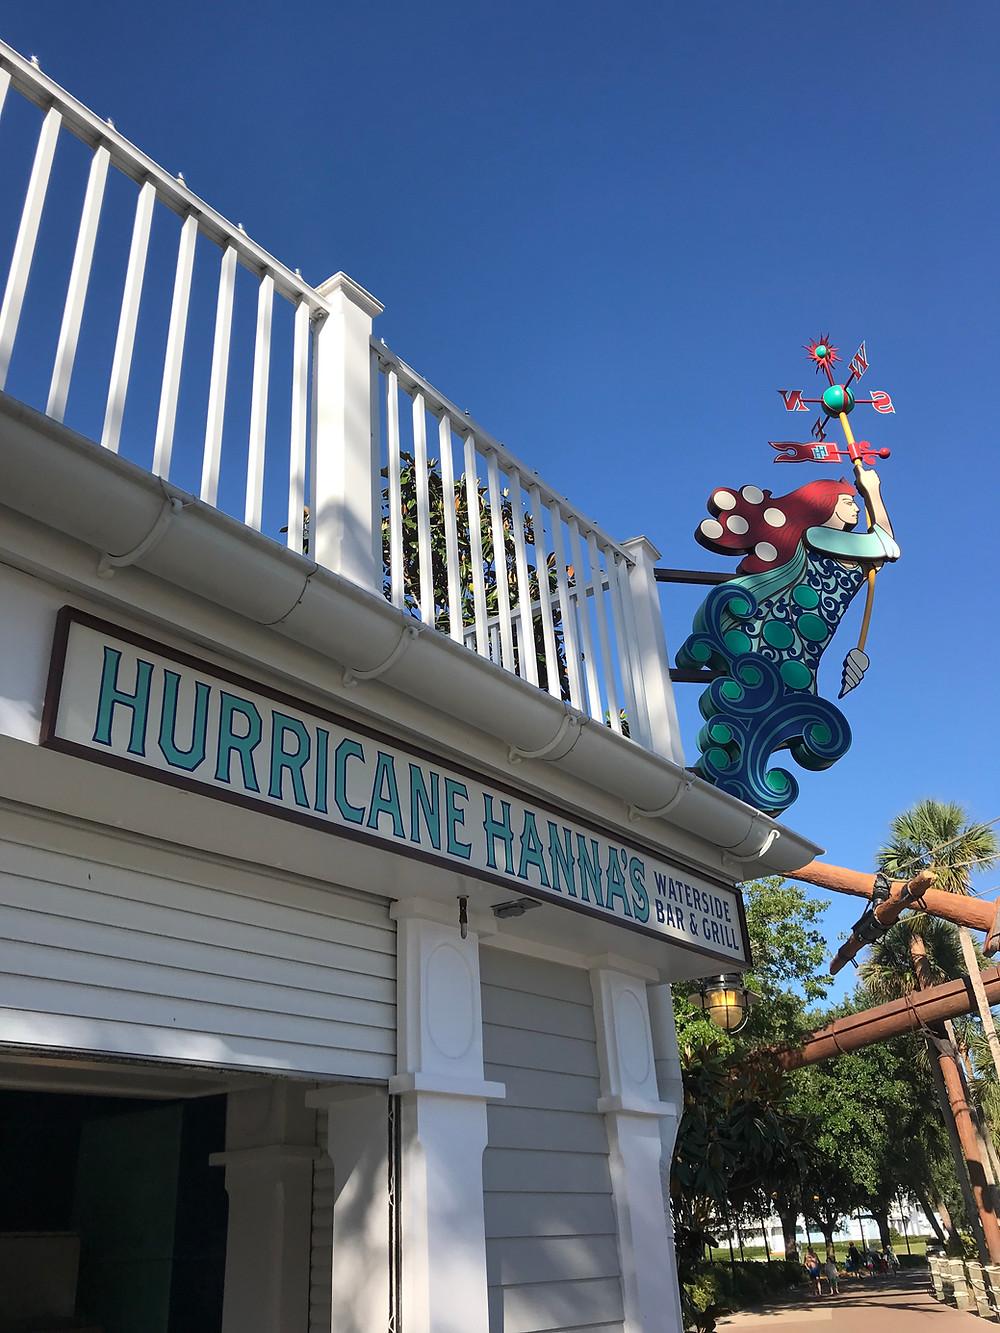 Hurricane Hanna's